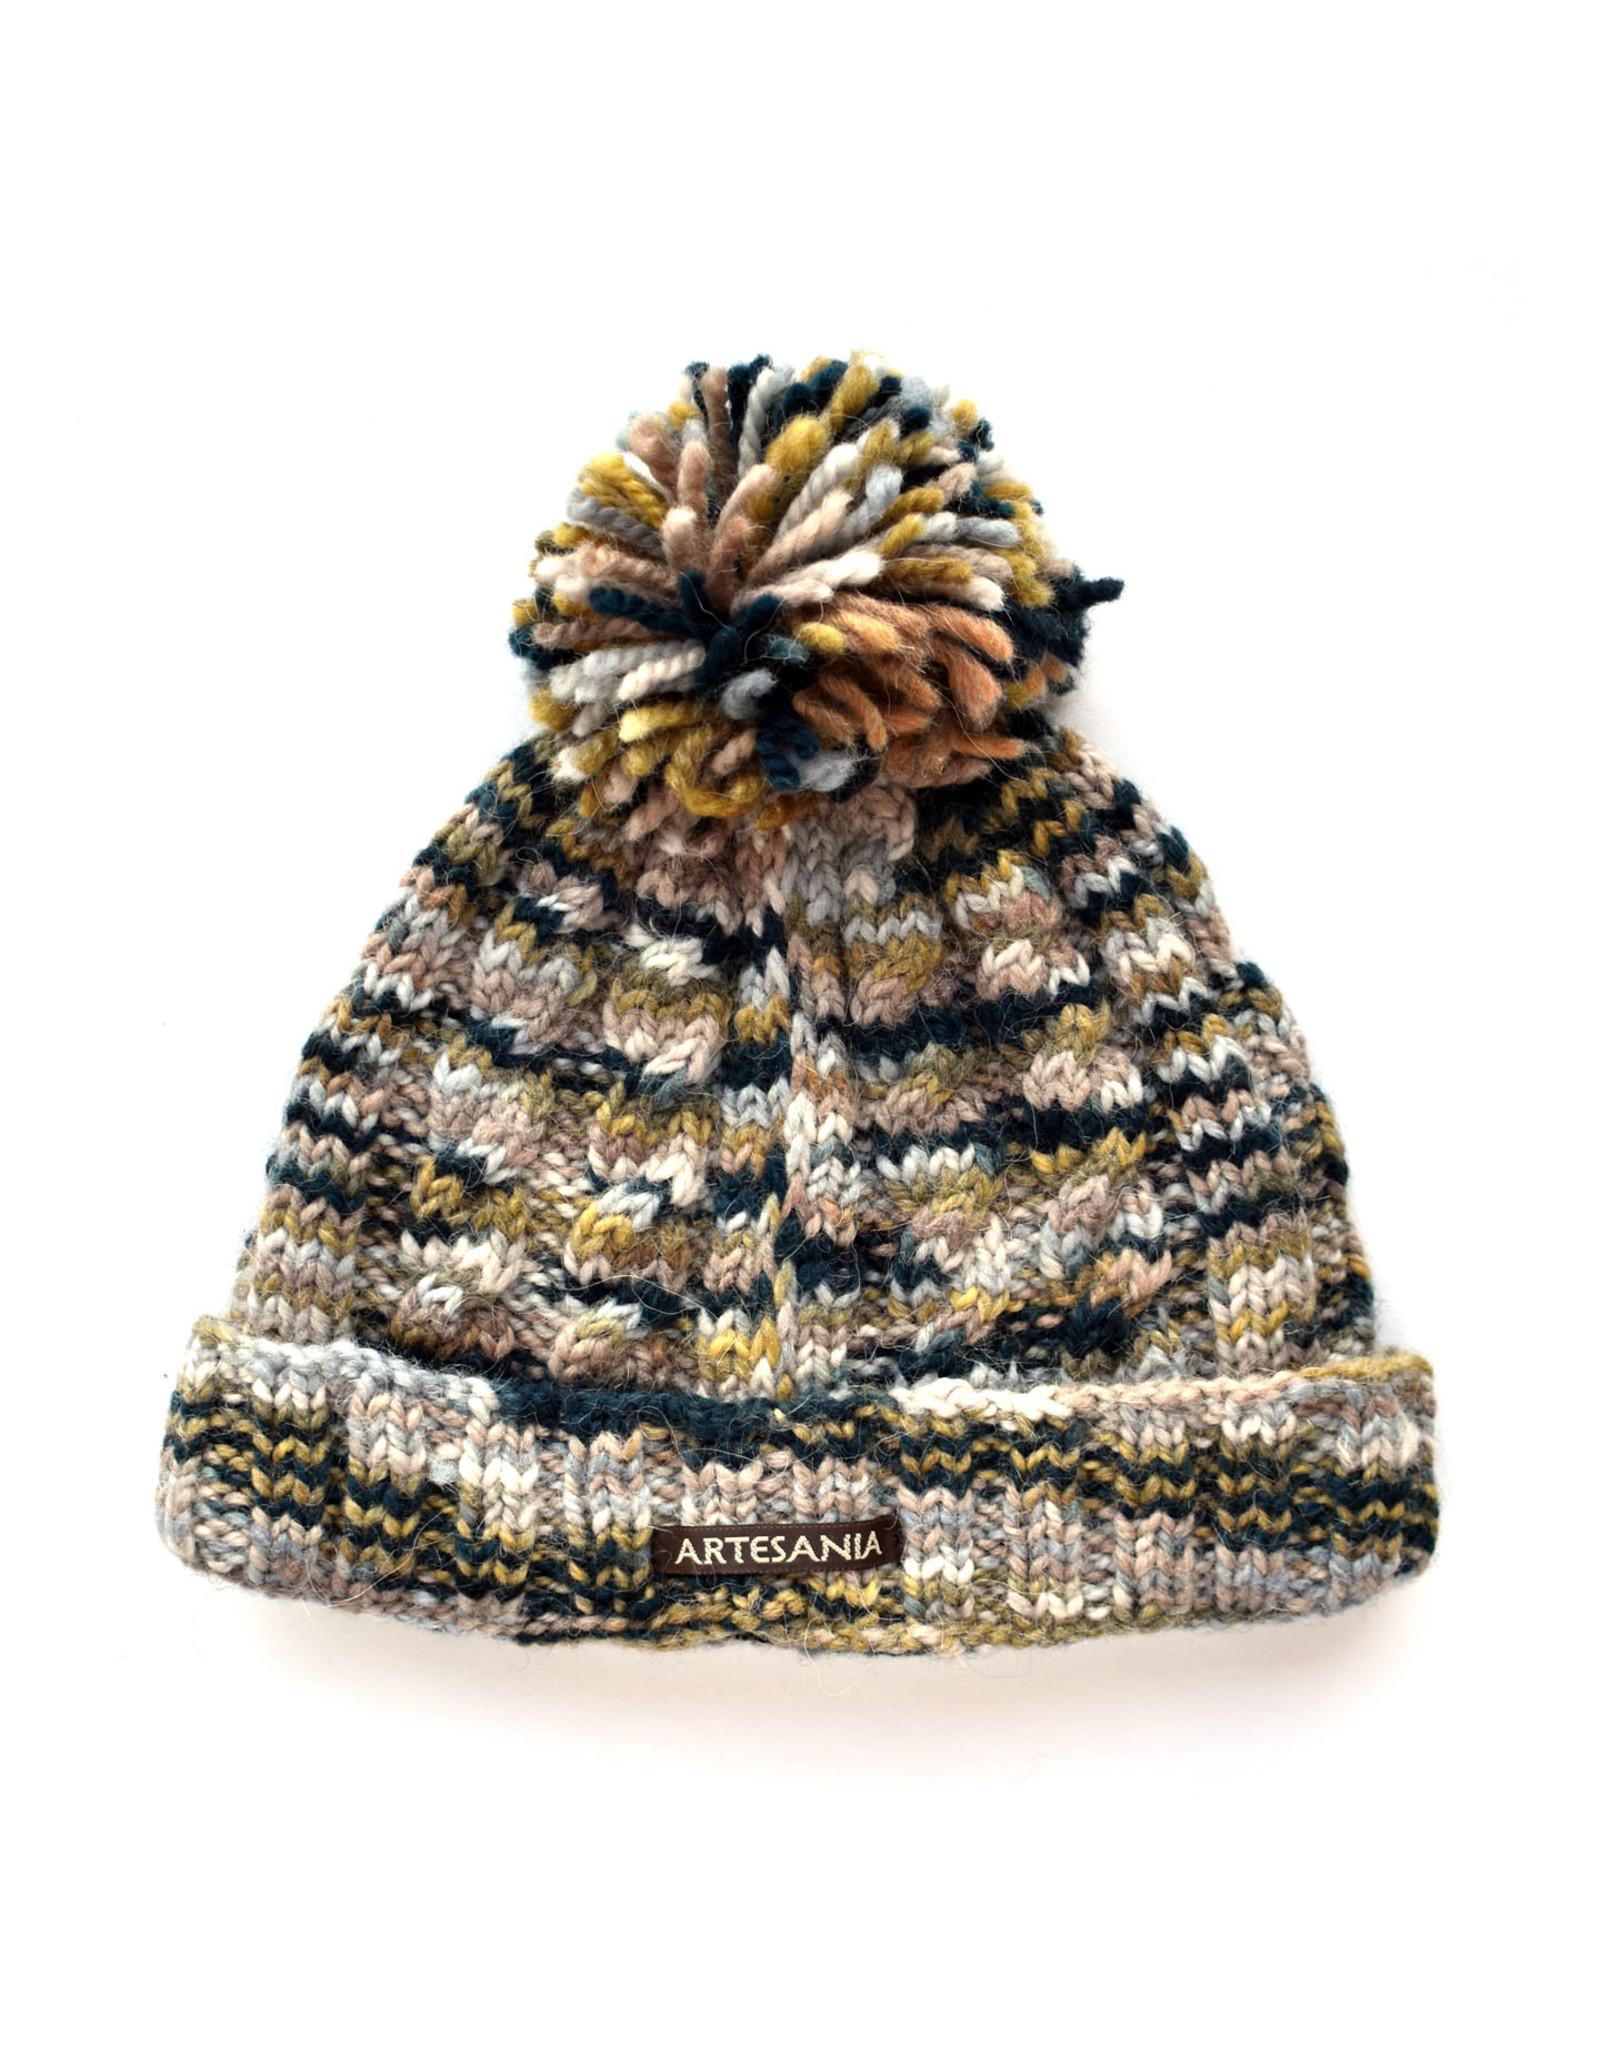 Artesania Speckle Knit Hat